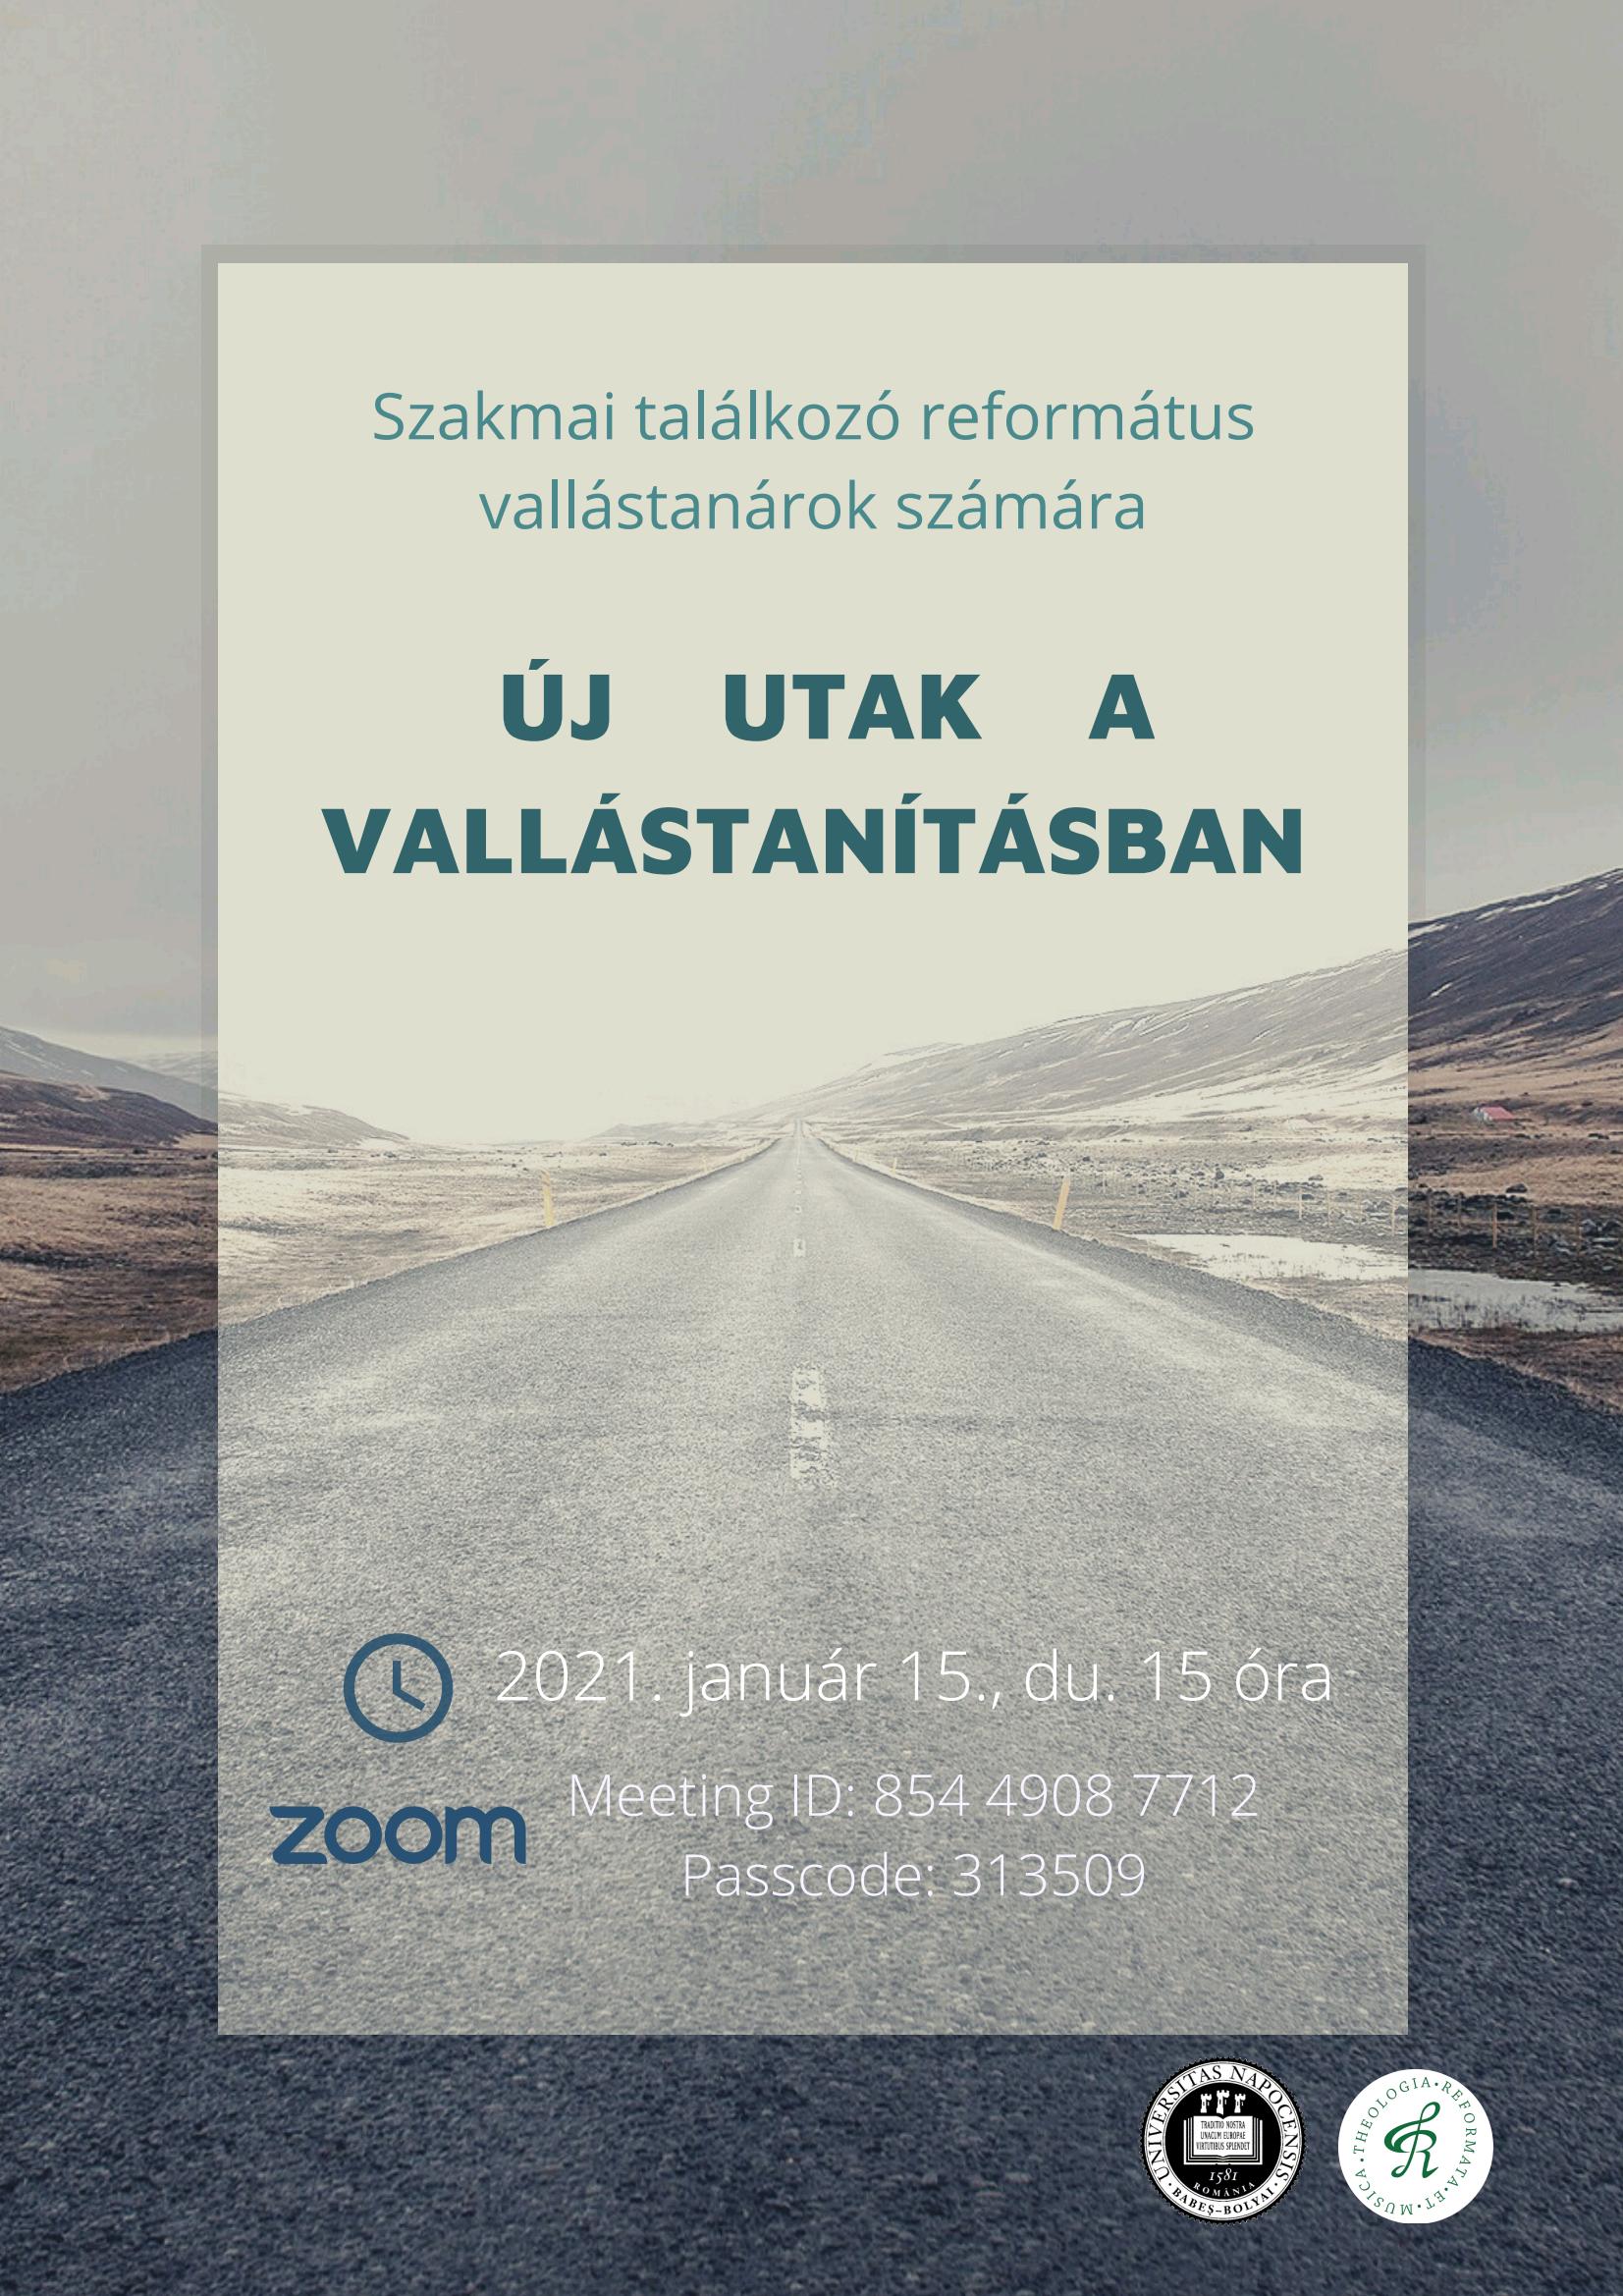 Új utak a vallástanításban (Noi drumuri în educația religioasă)